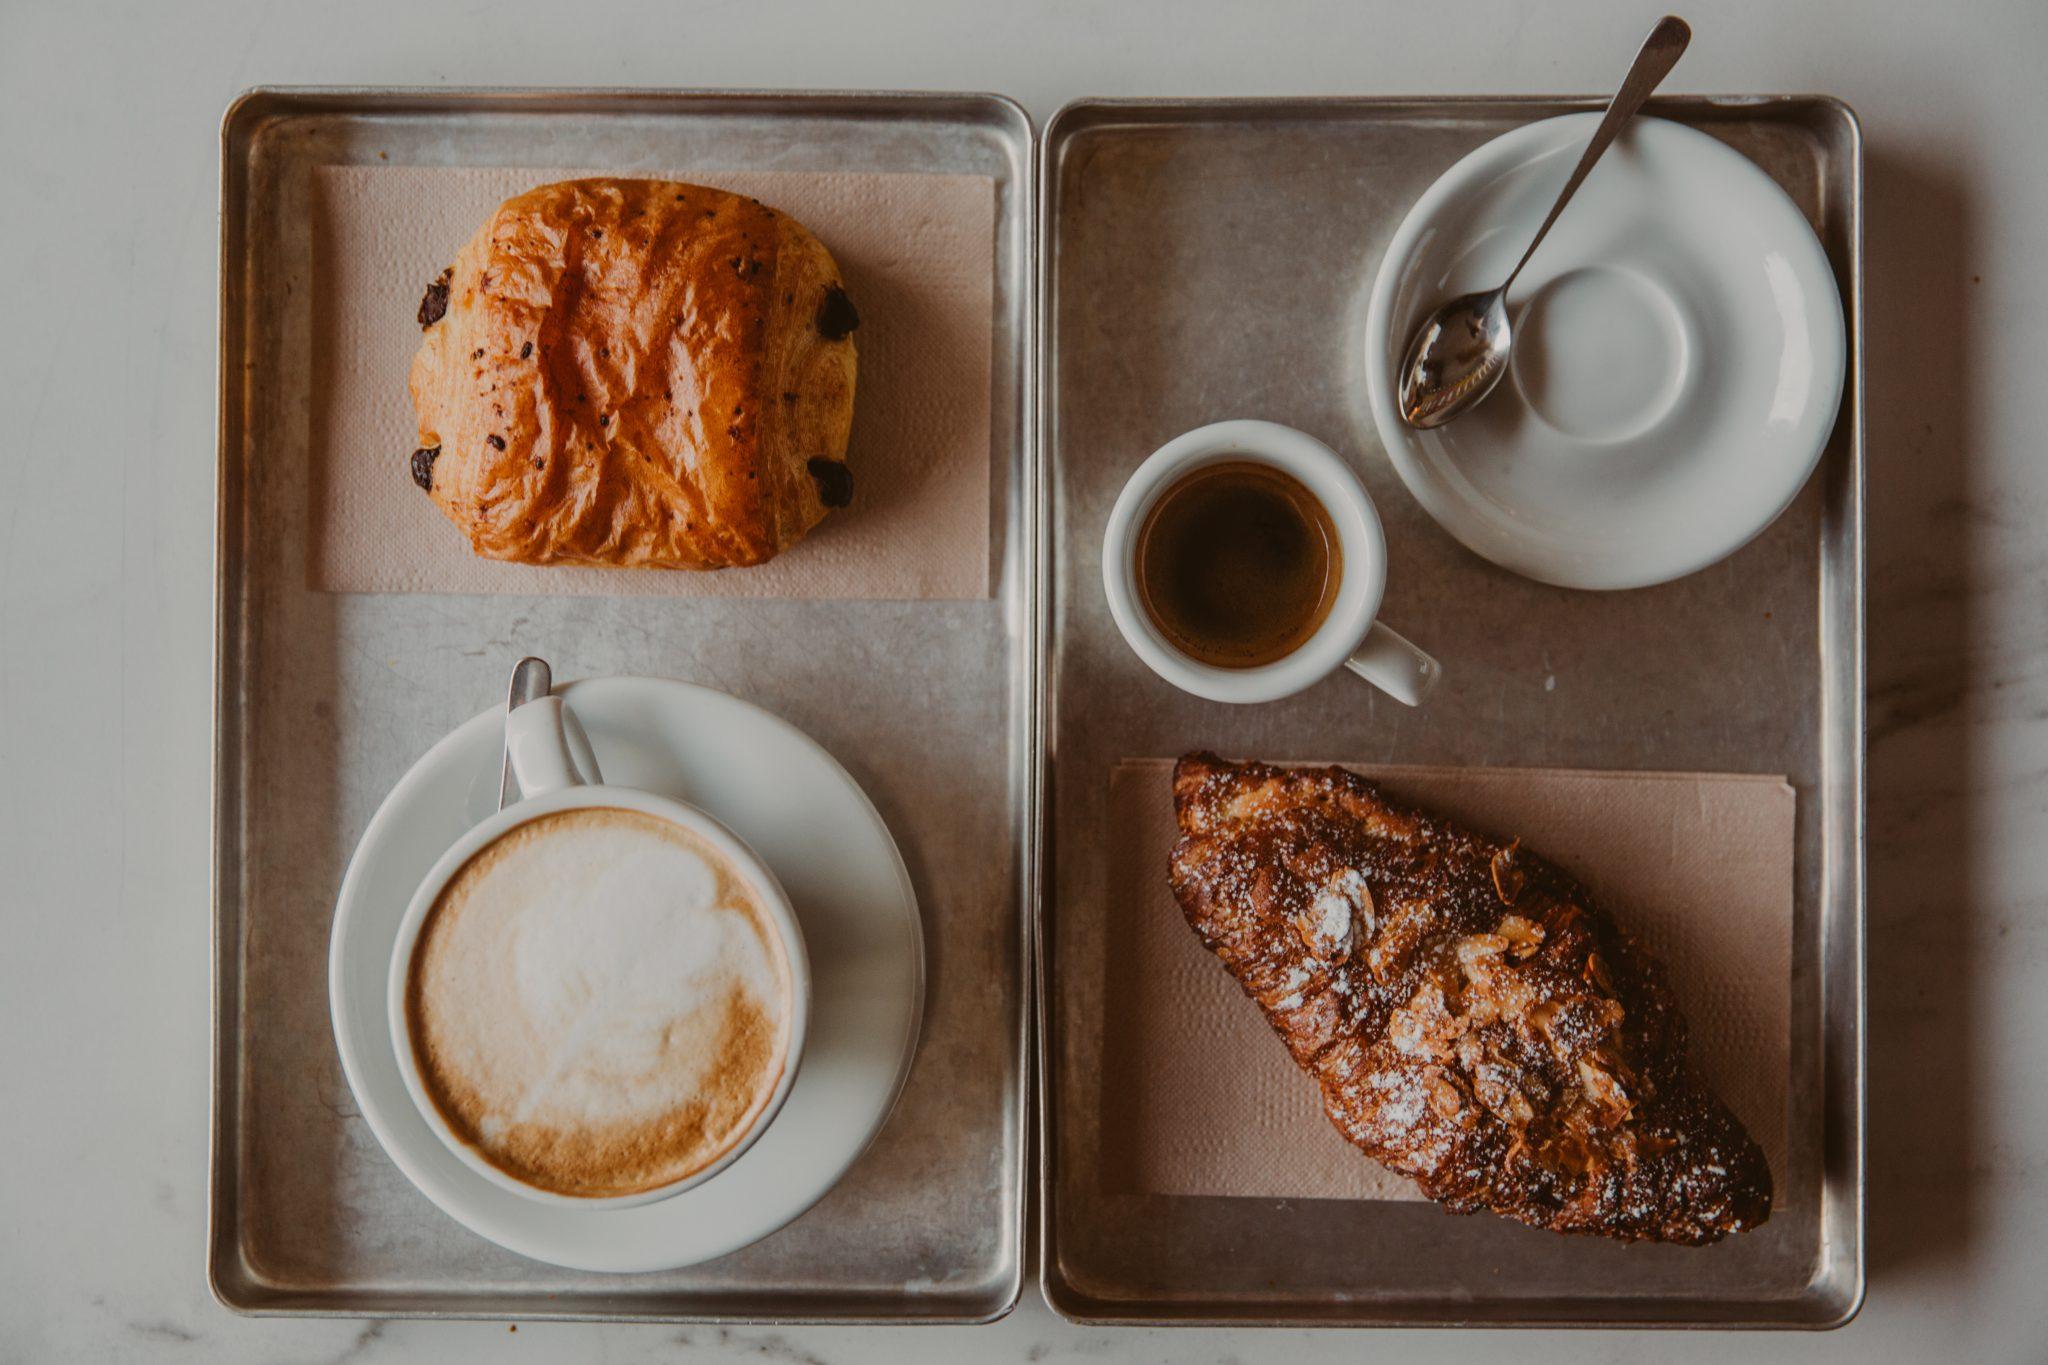 Kaffee und Croissants - Coucou Food Market